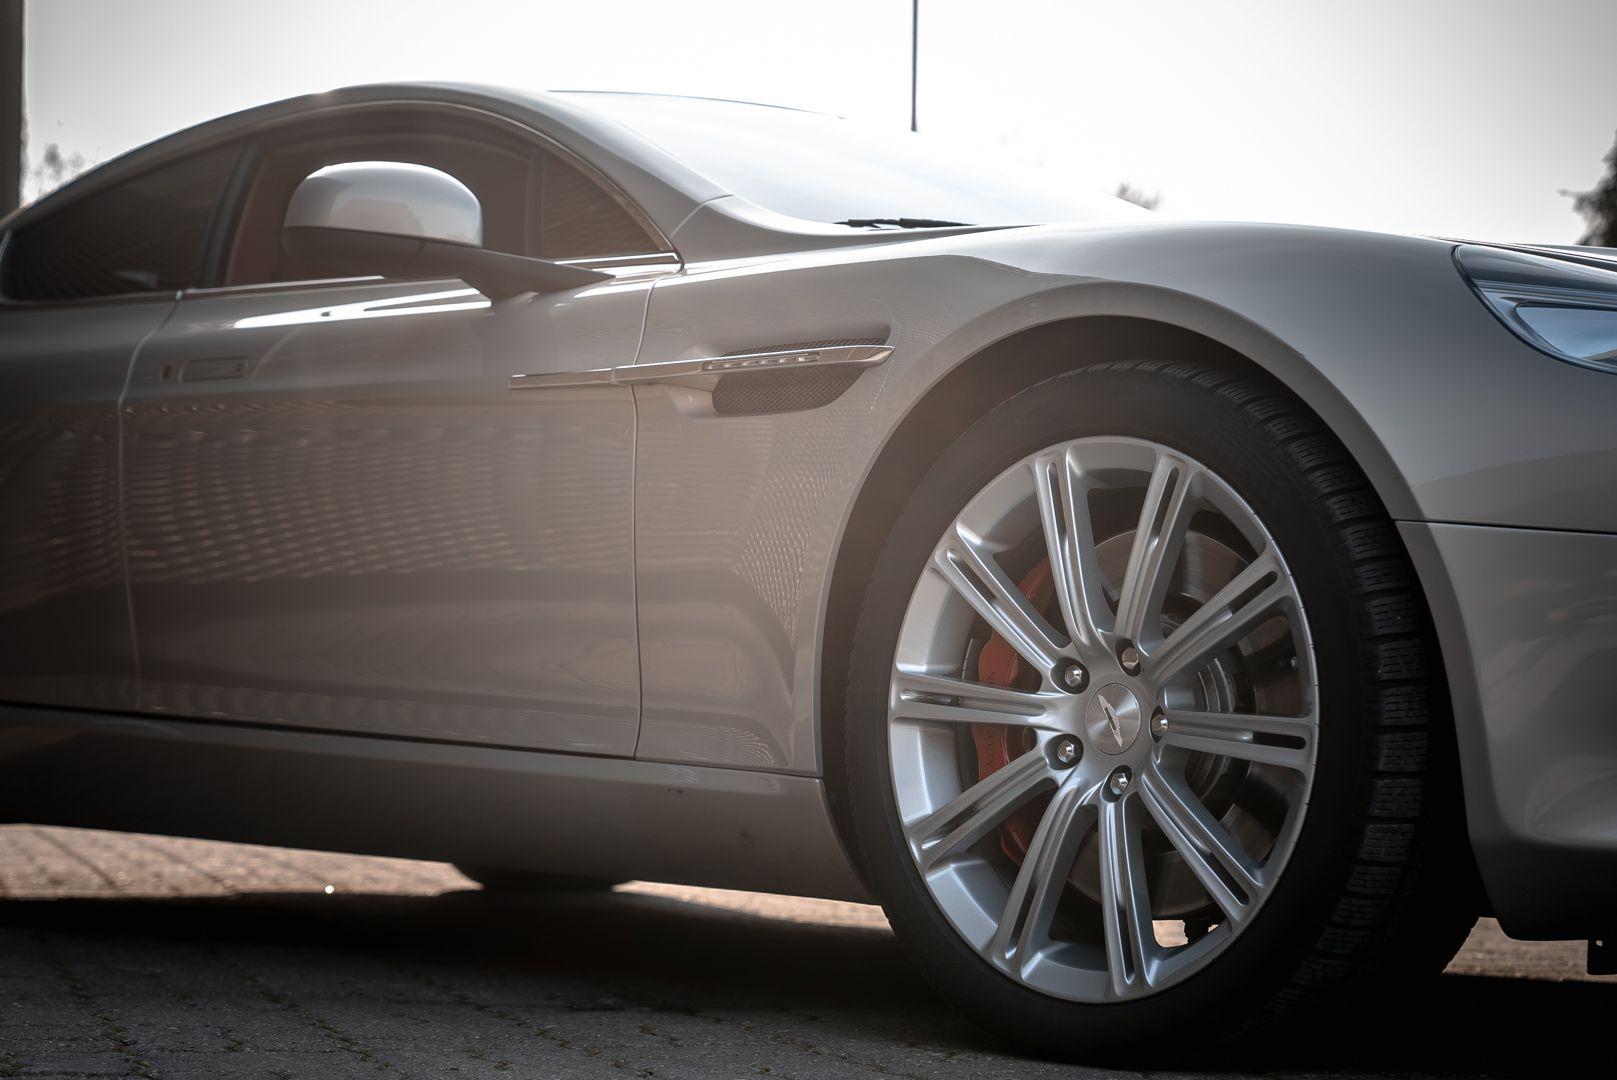 2010 Aston Martin Rapide 6.0 V12 62567